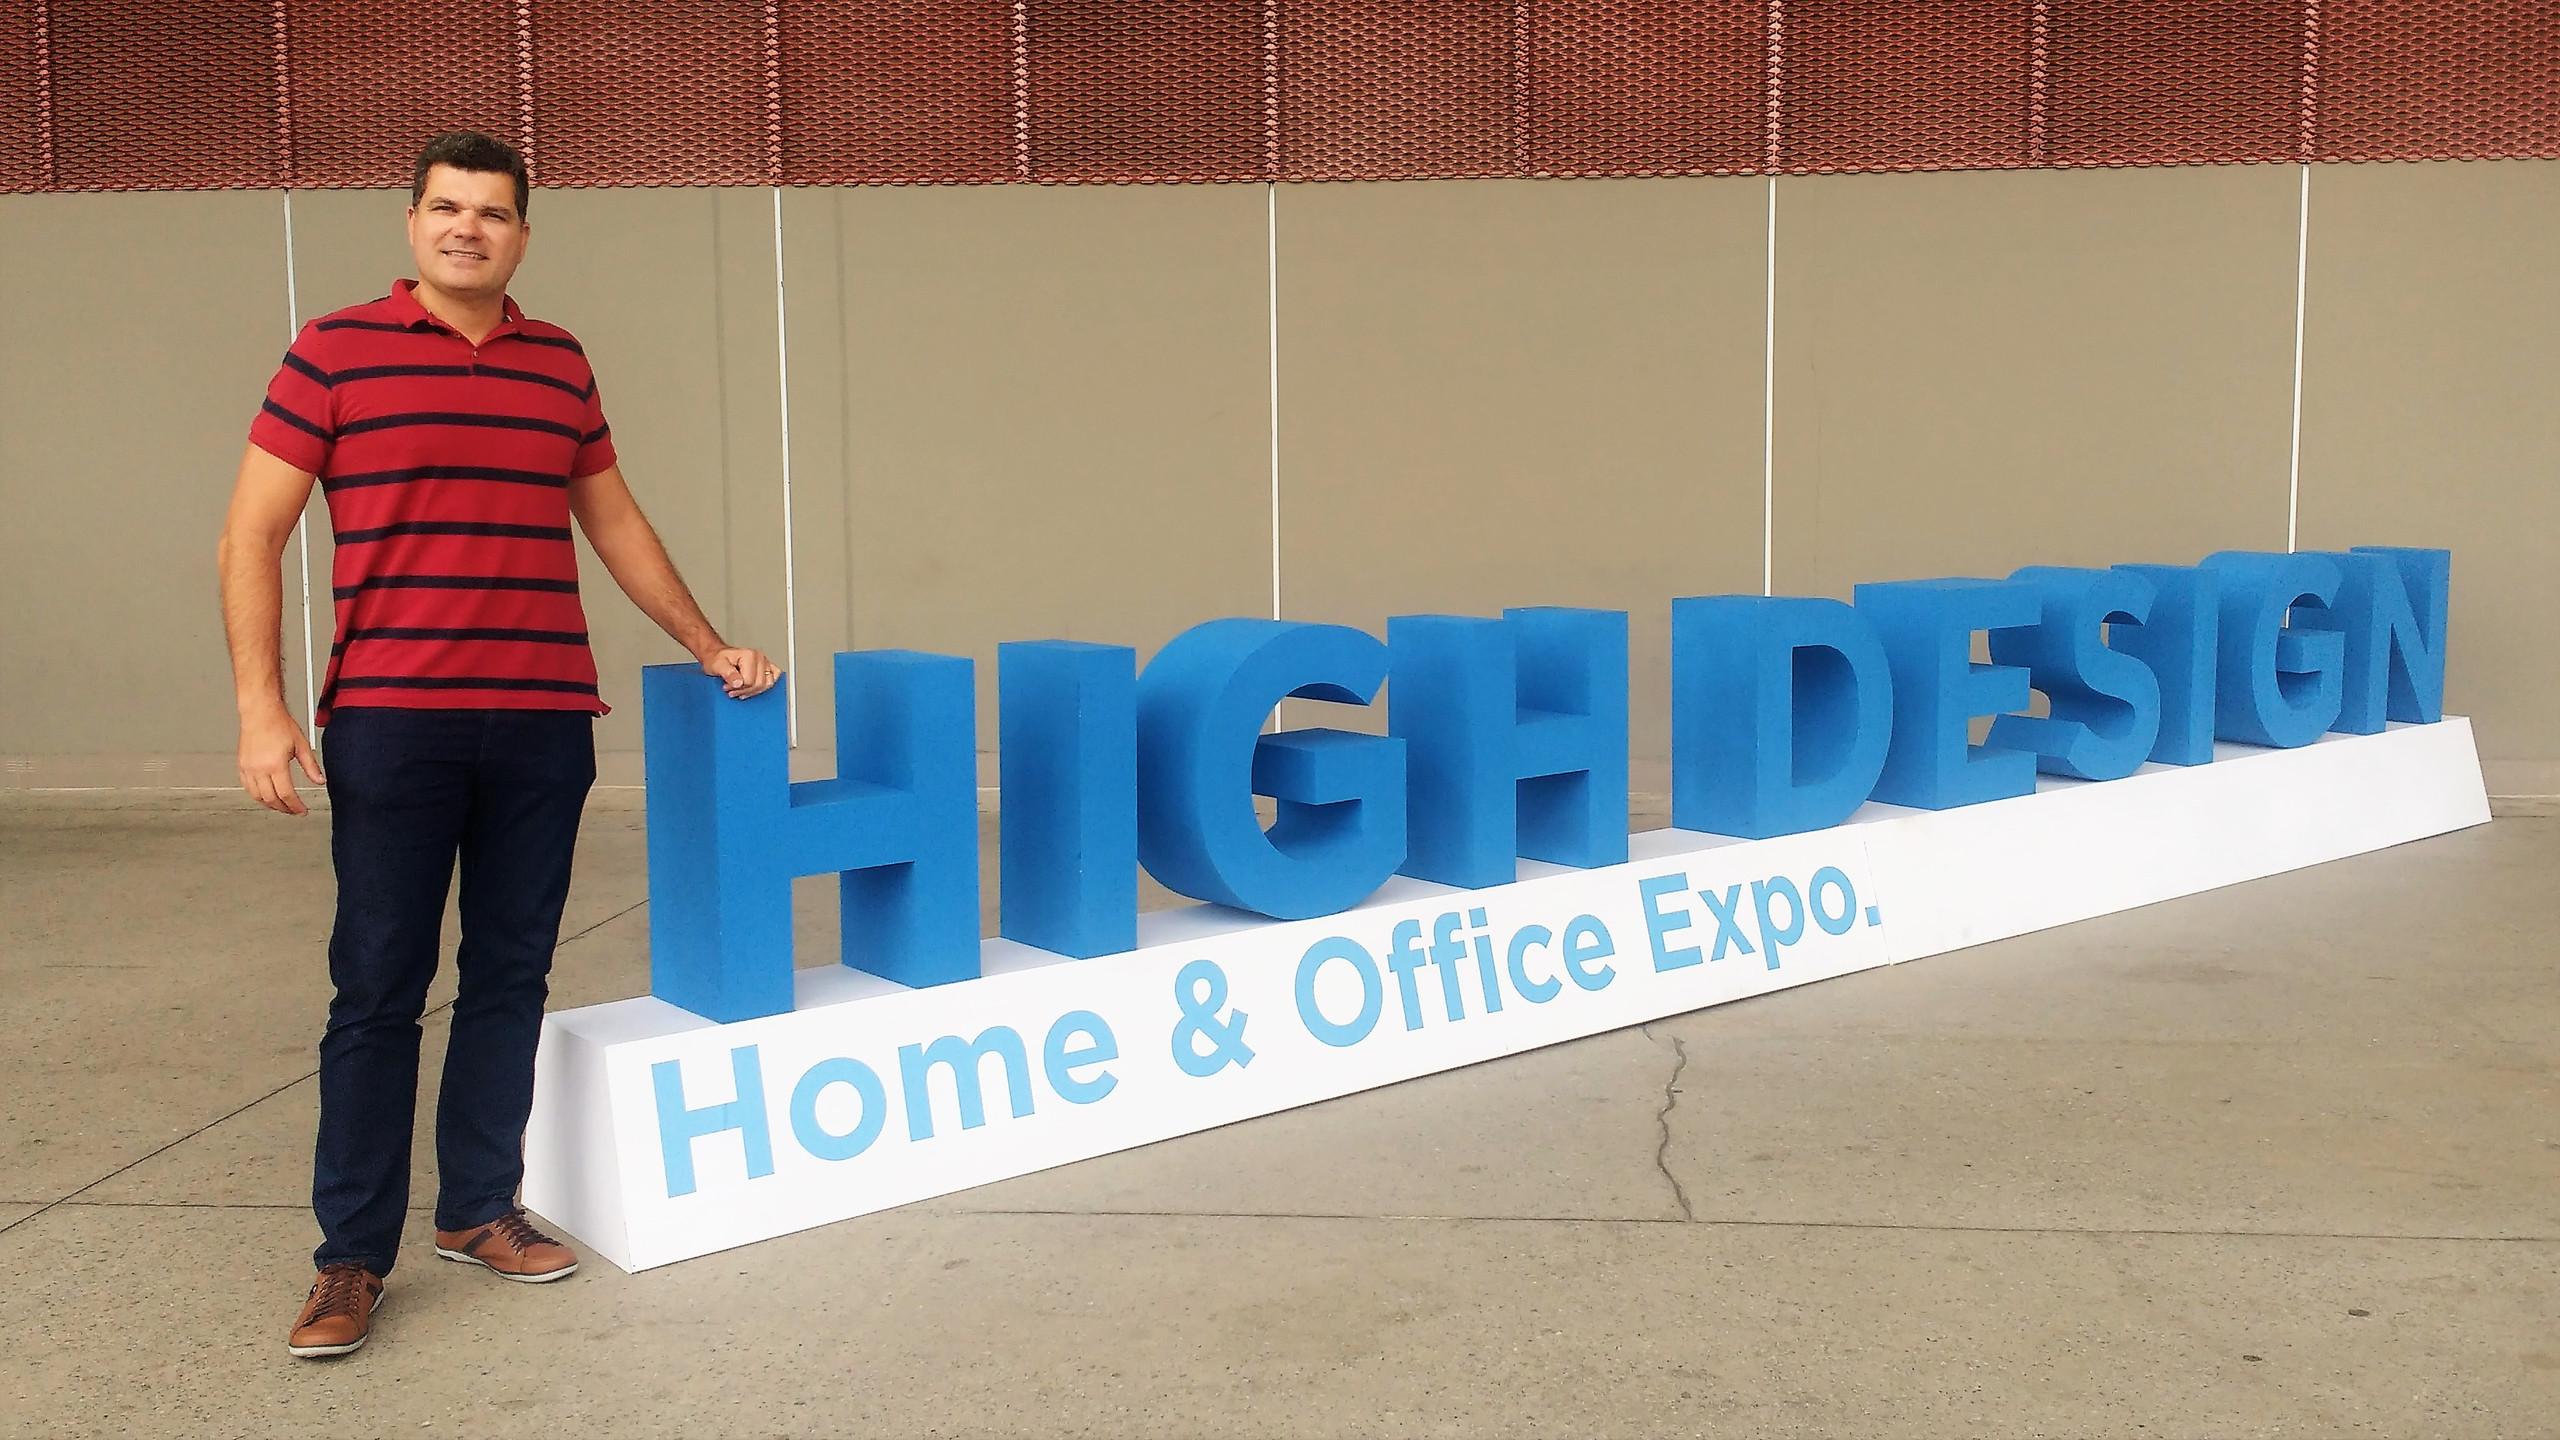 High Design Home & Office Expo